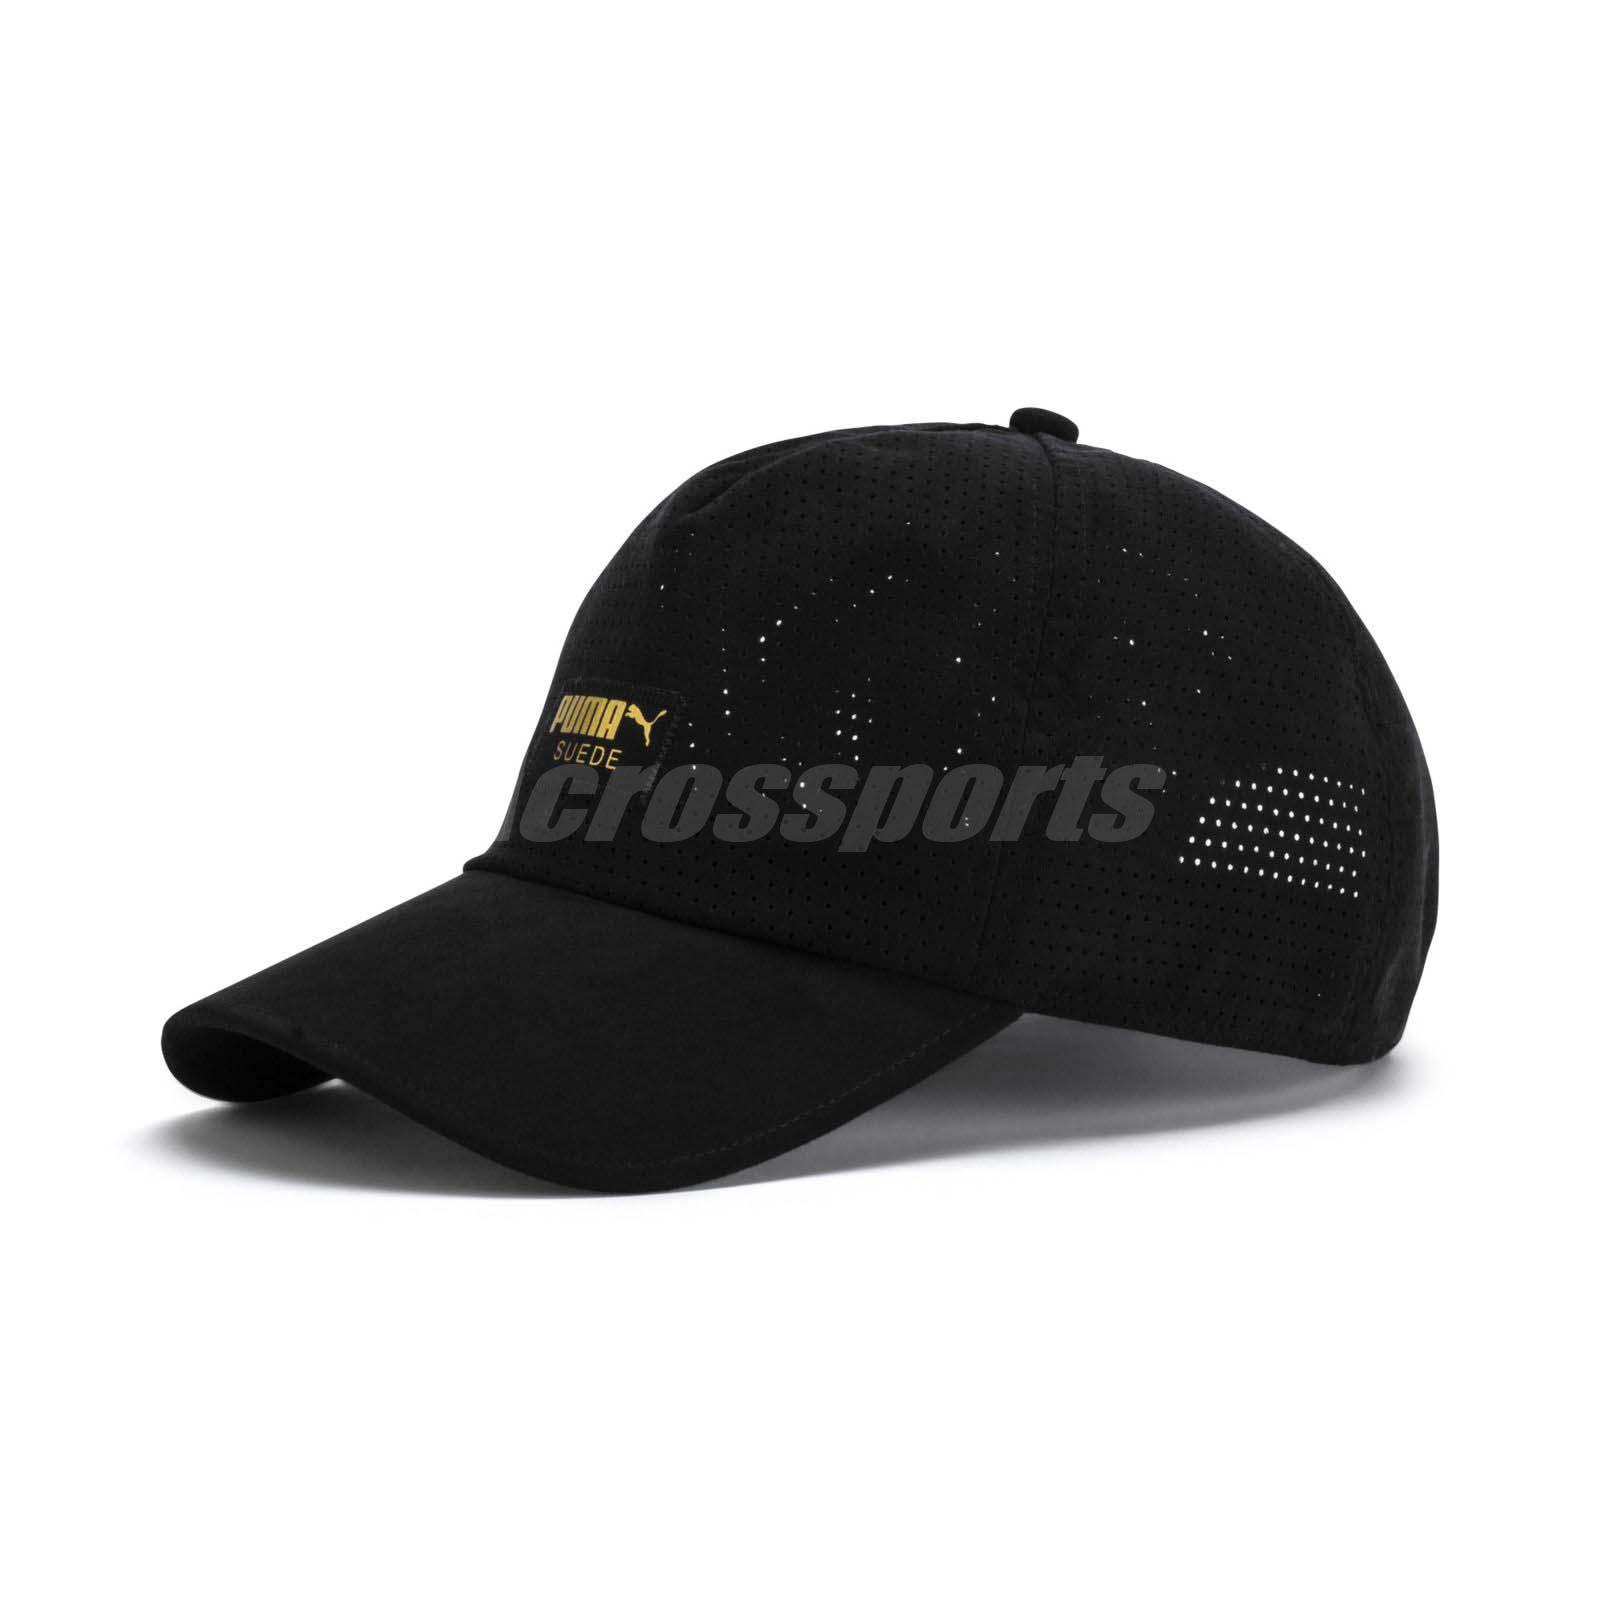 e9a4df88df39e Puma Unisex Suede Baseball Cap Sport Running Training Workout Hat Black  02171701